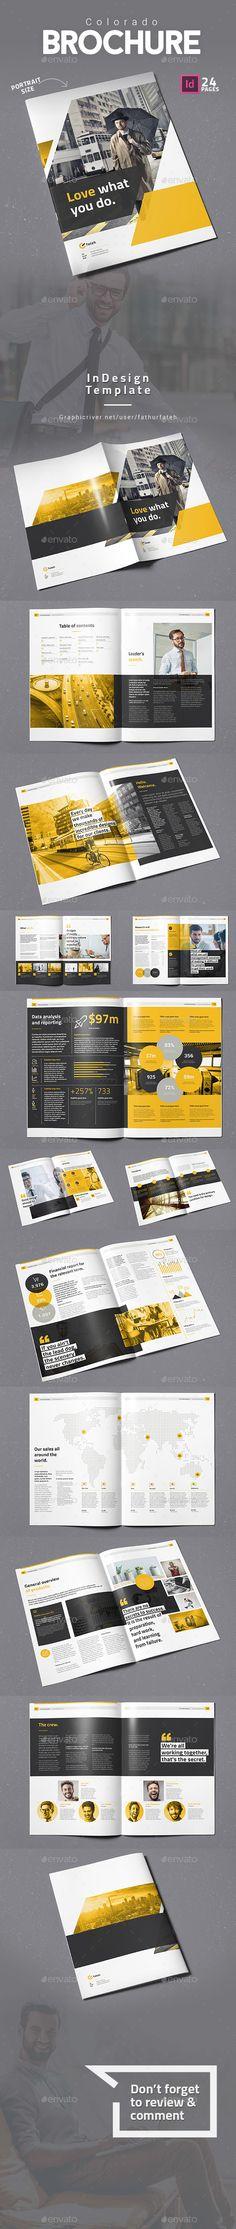 Colorado Brochure Template InDesign INDD